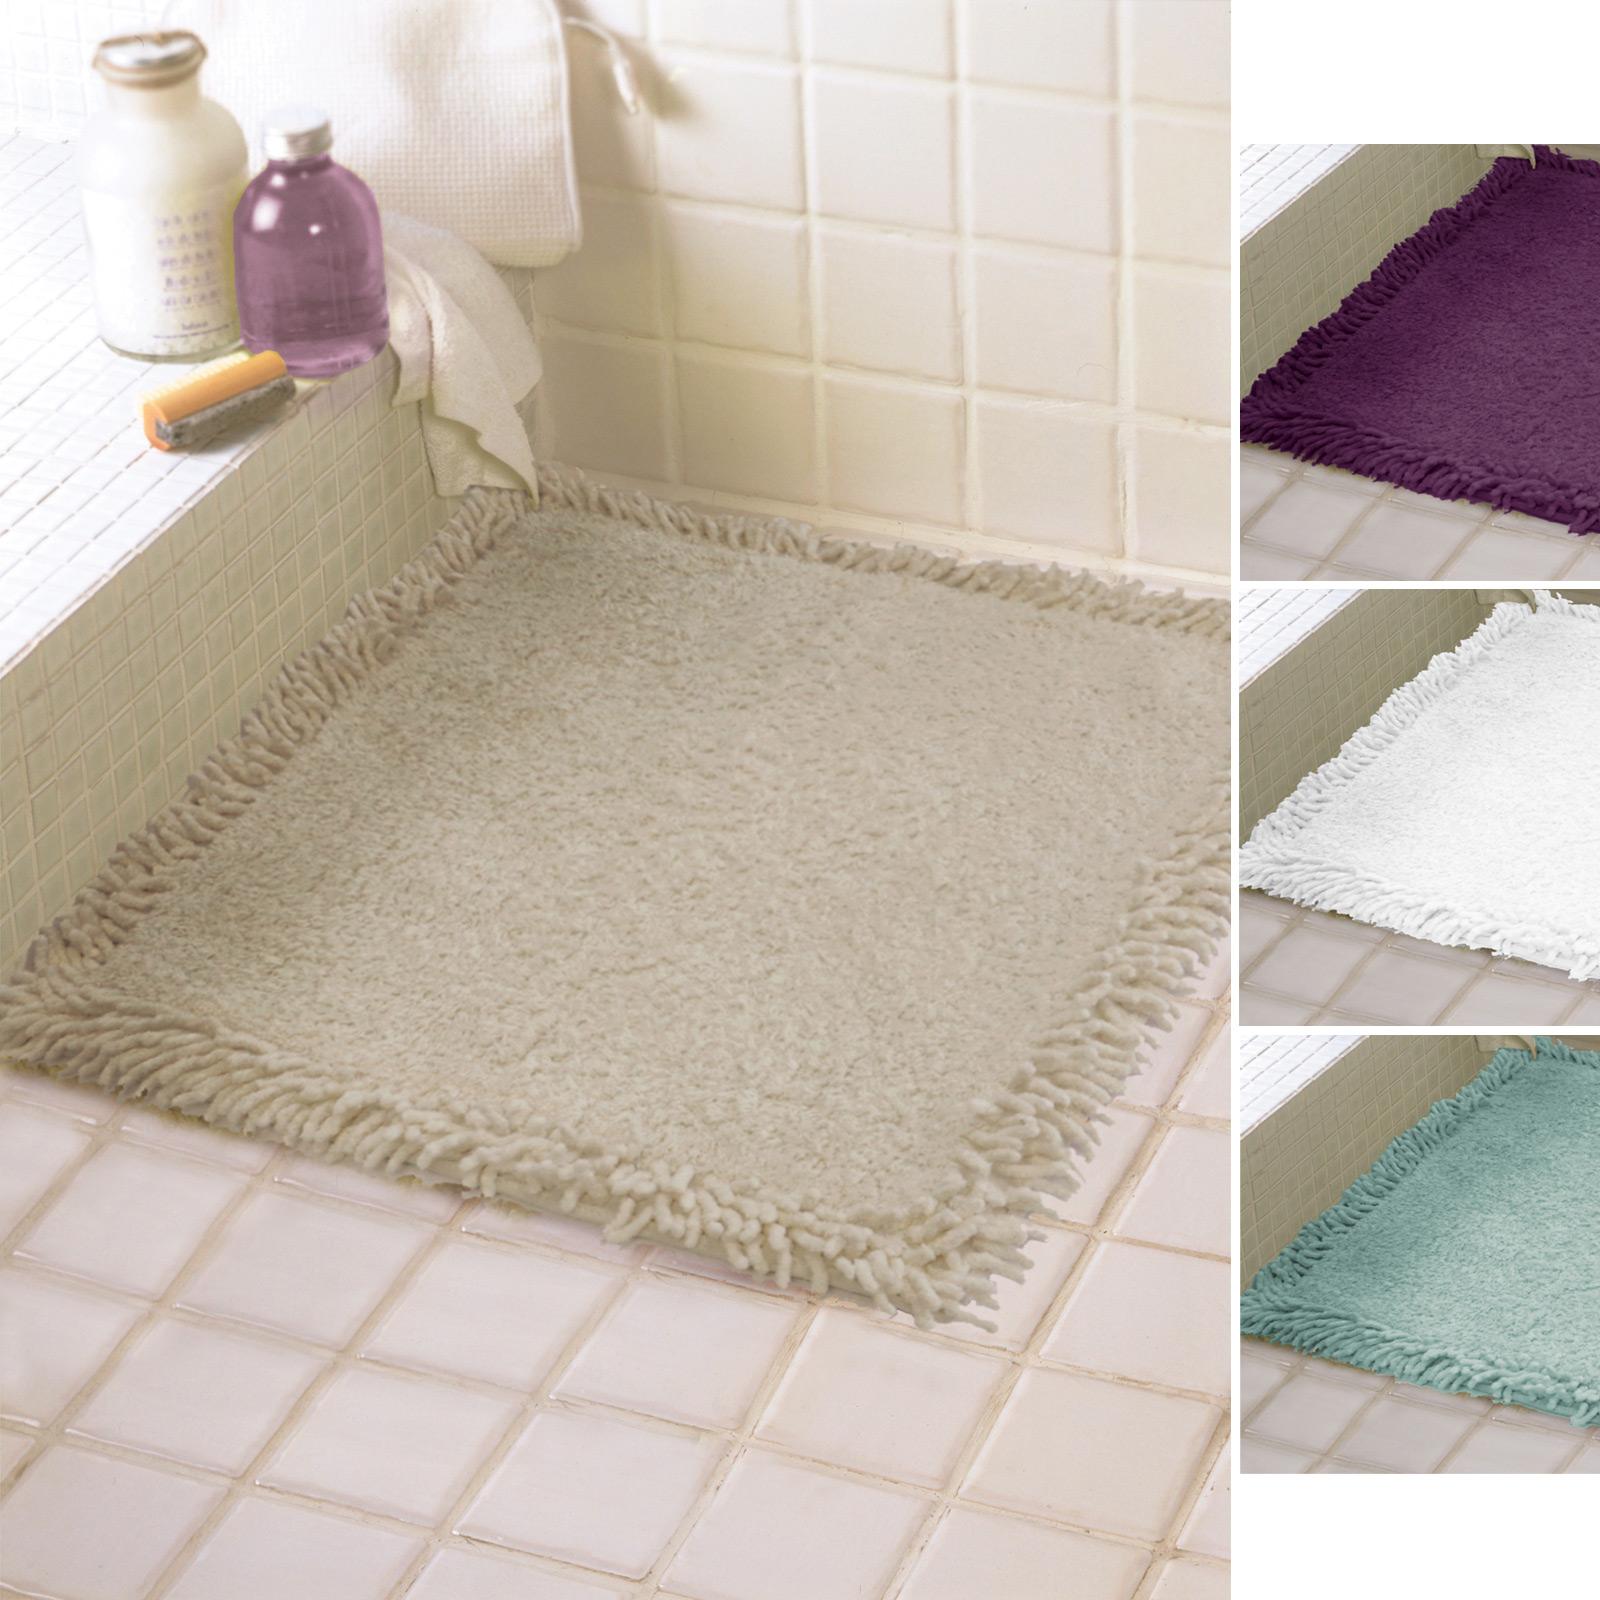 60cm X 60cm Shower Mat Floor Towel Bath Rug 100% Cotton Plum Aqua Stone White